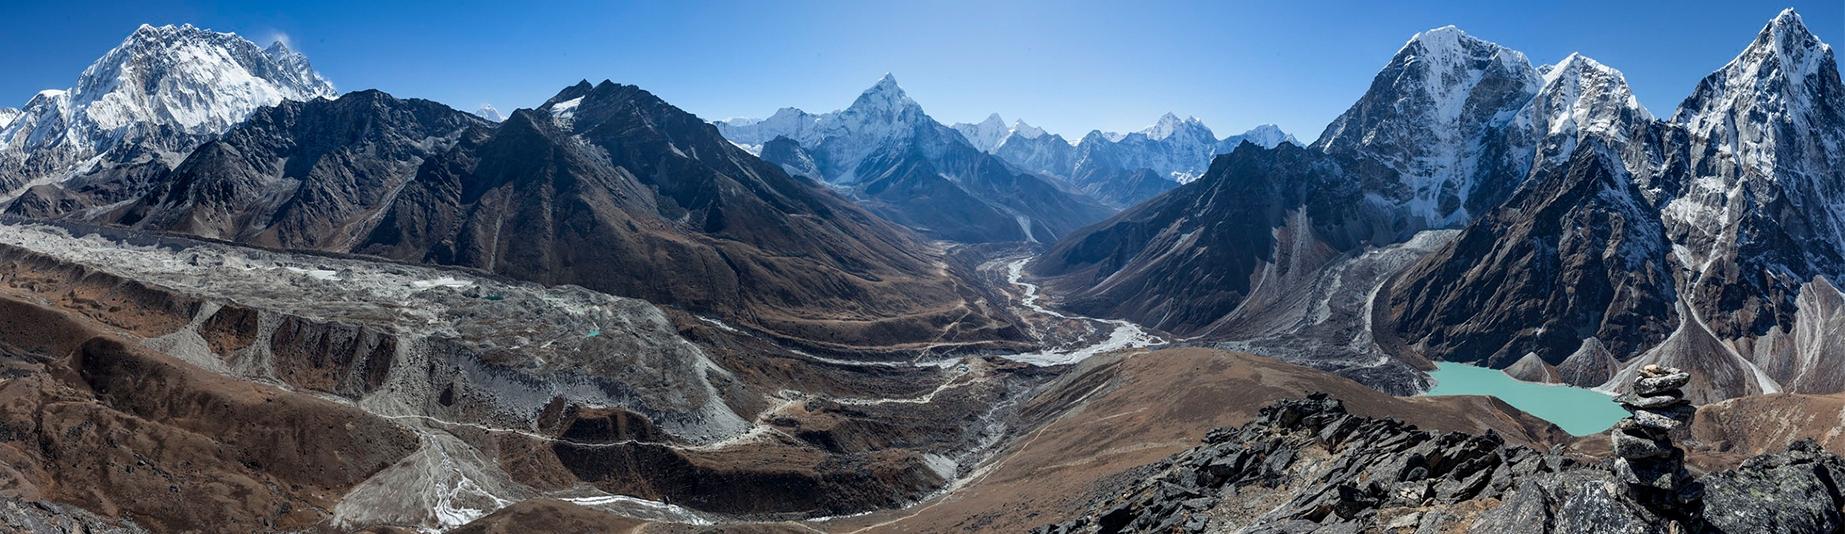 Awi peak, offers superb mountain vista and Khumbu valley in Everest region trekking.